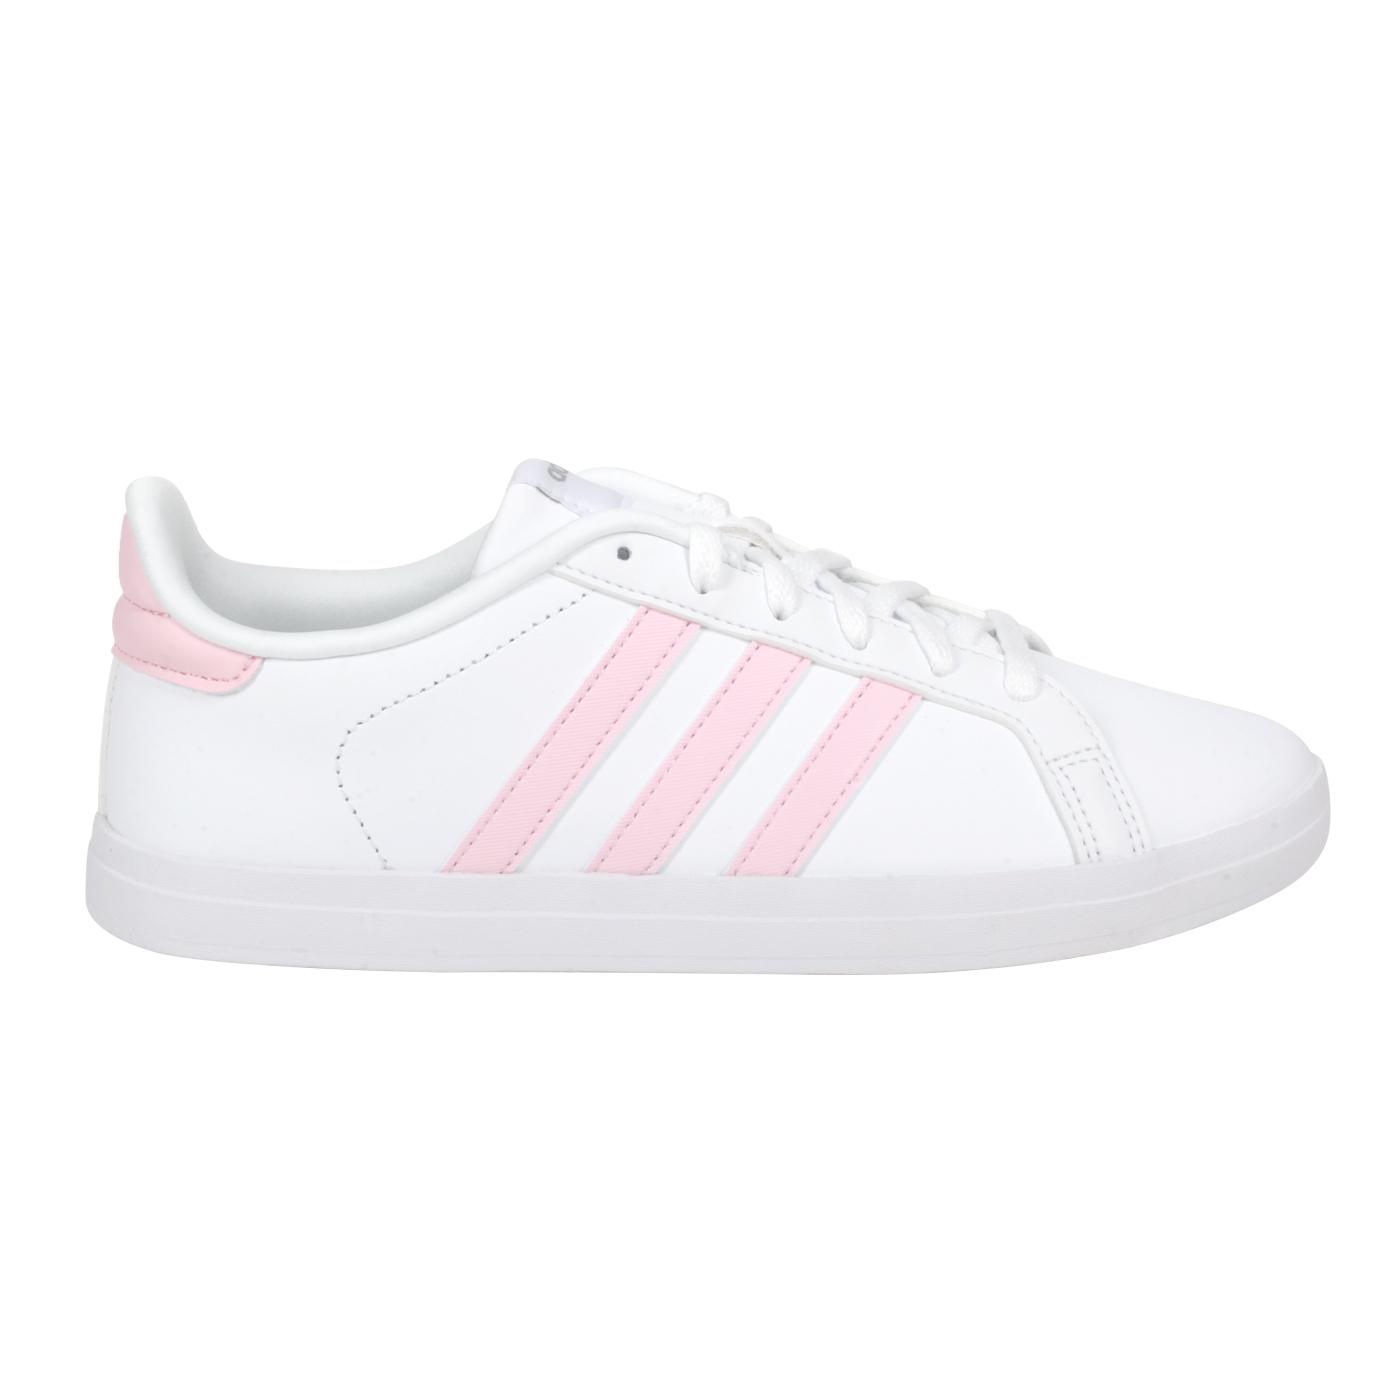 ADIDAS 女款休閒鞋 FY6950